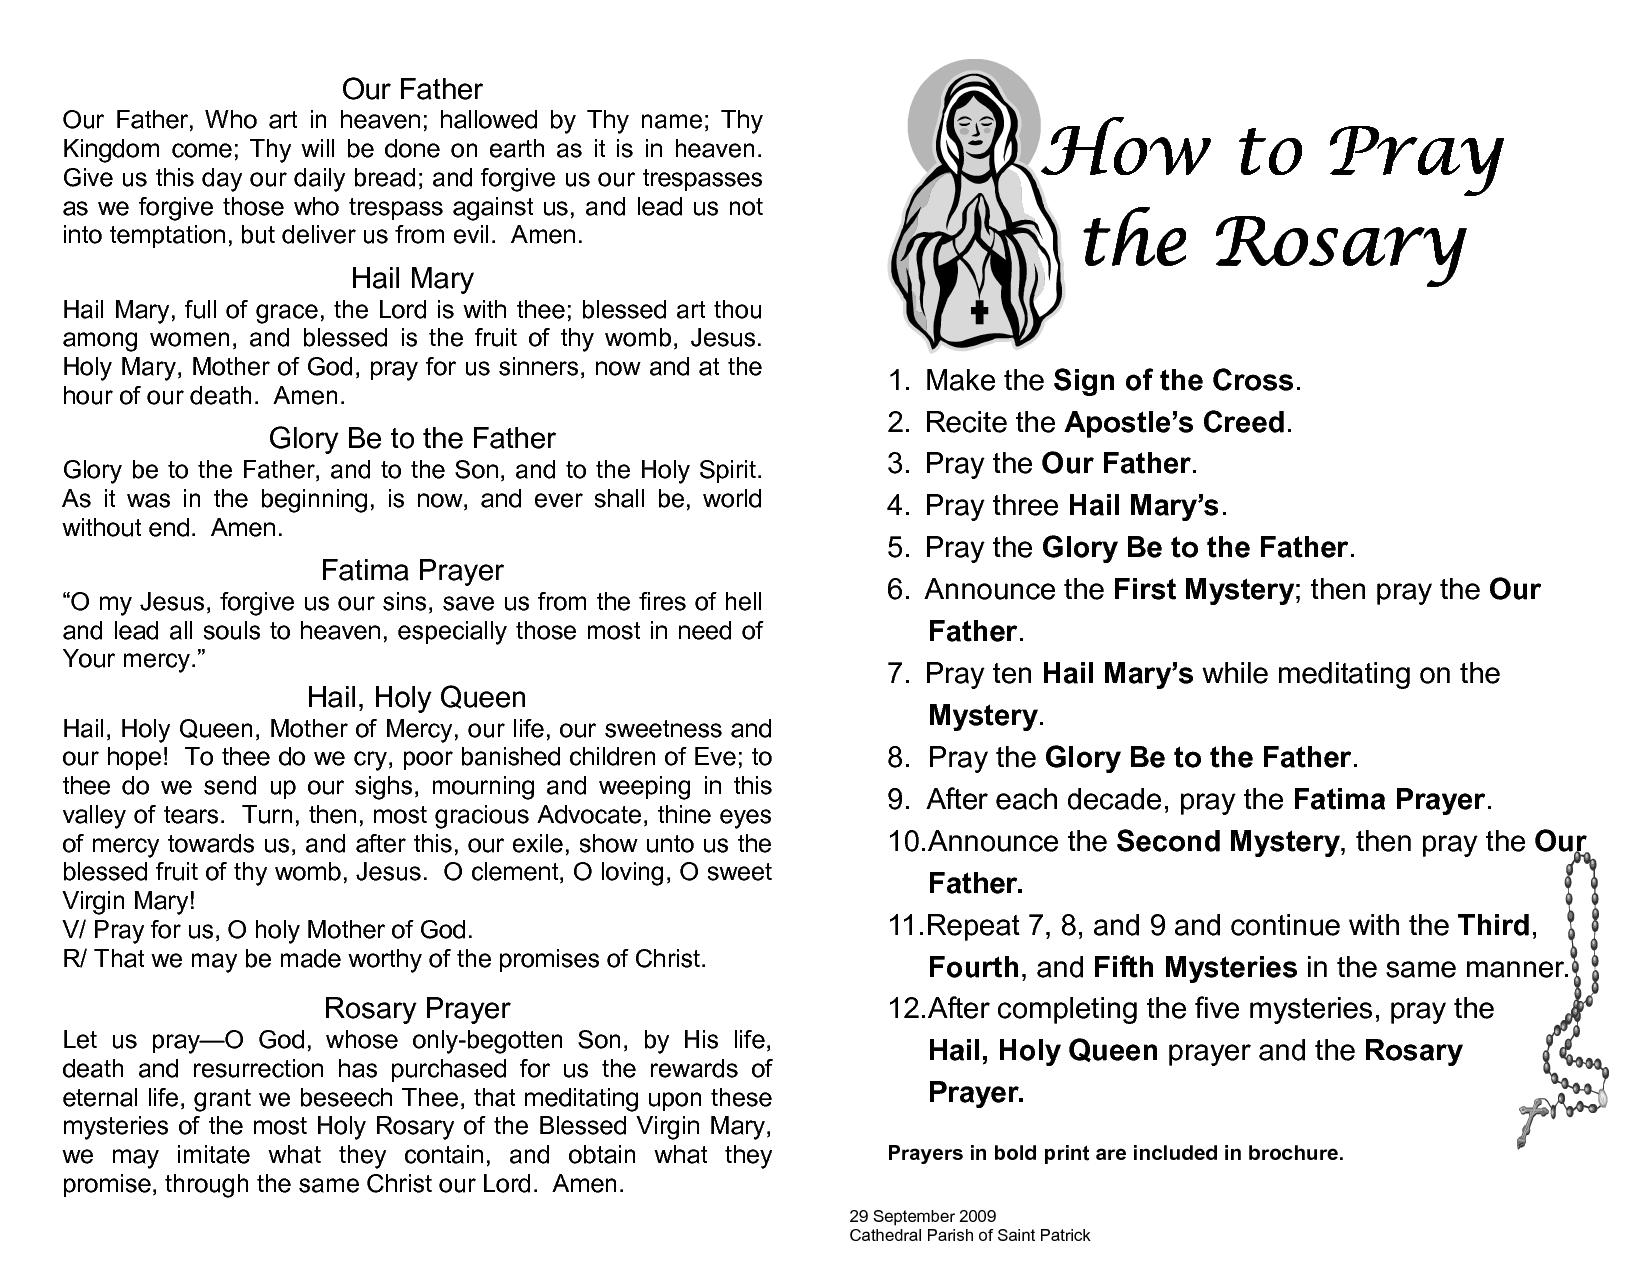 medium resolution of printable rosary prayer guide